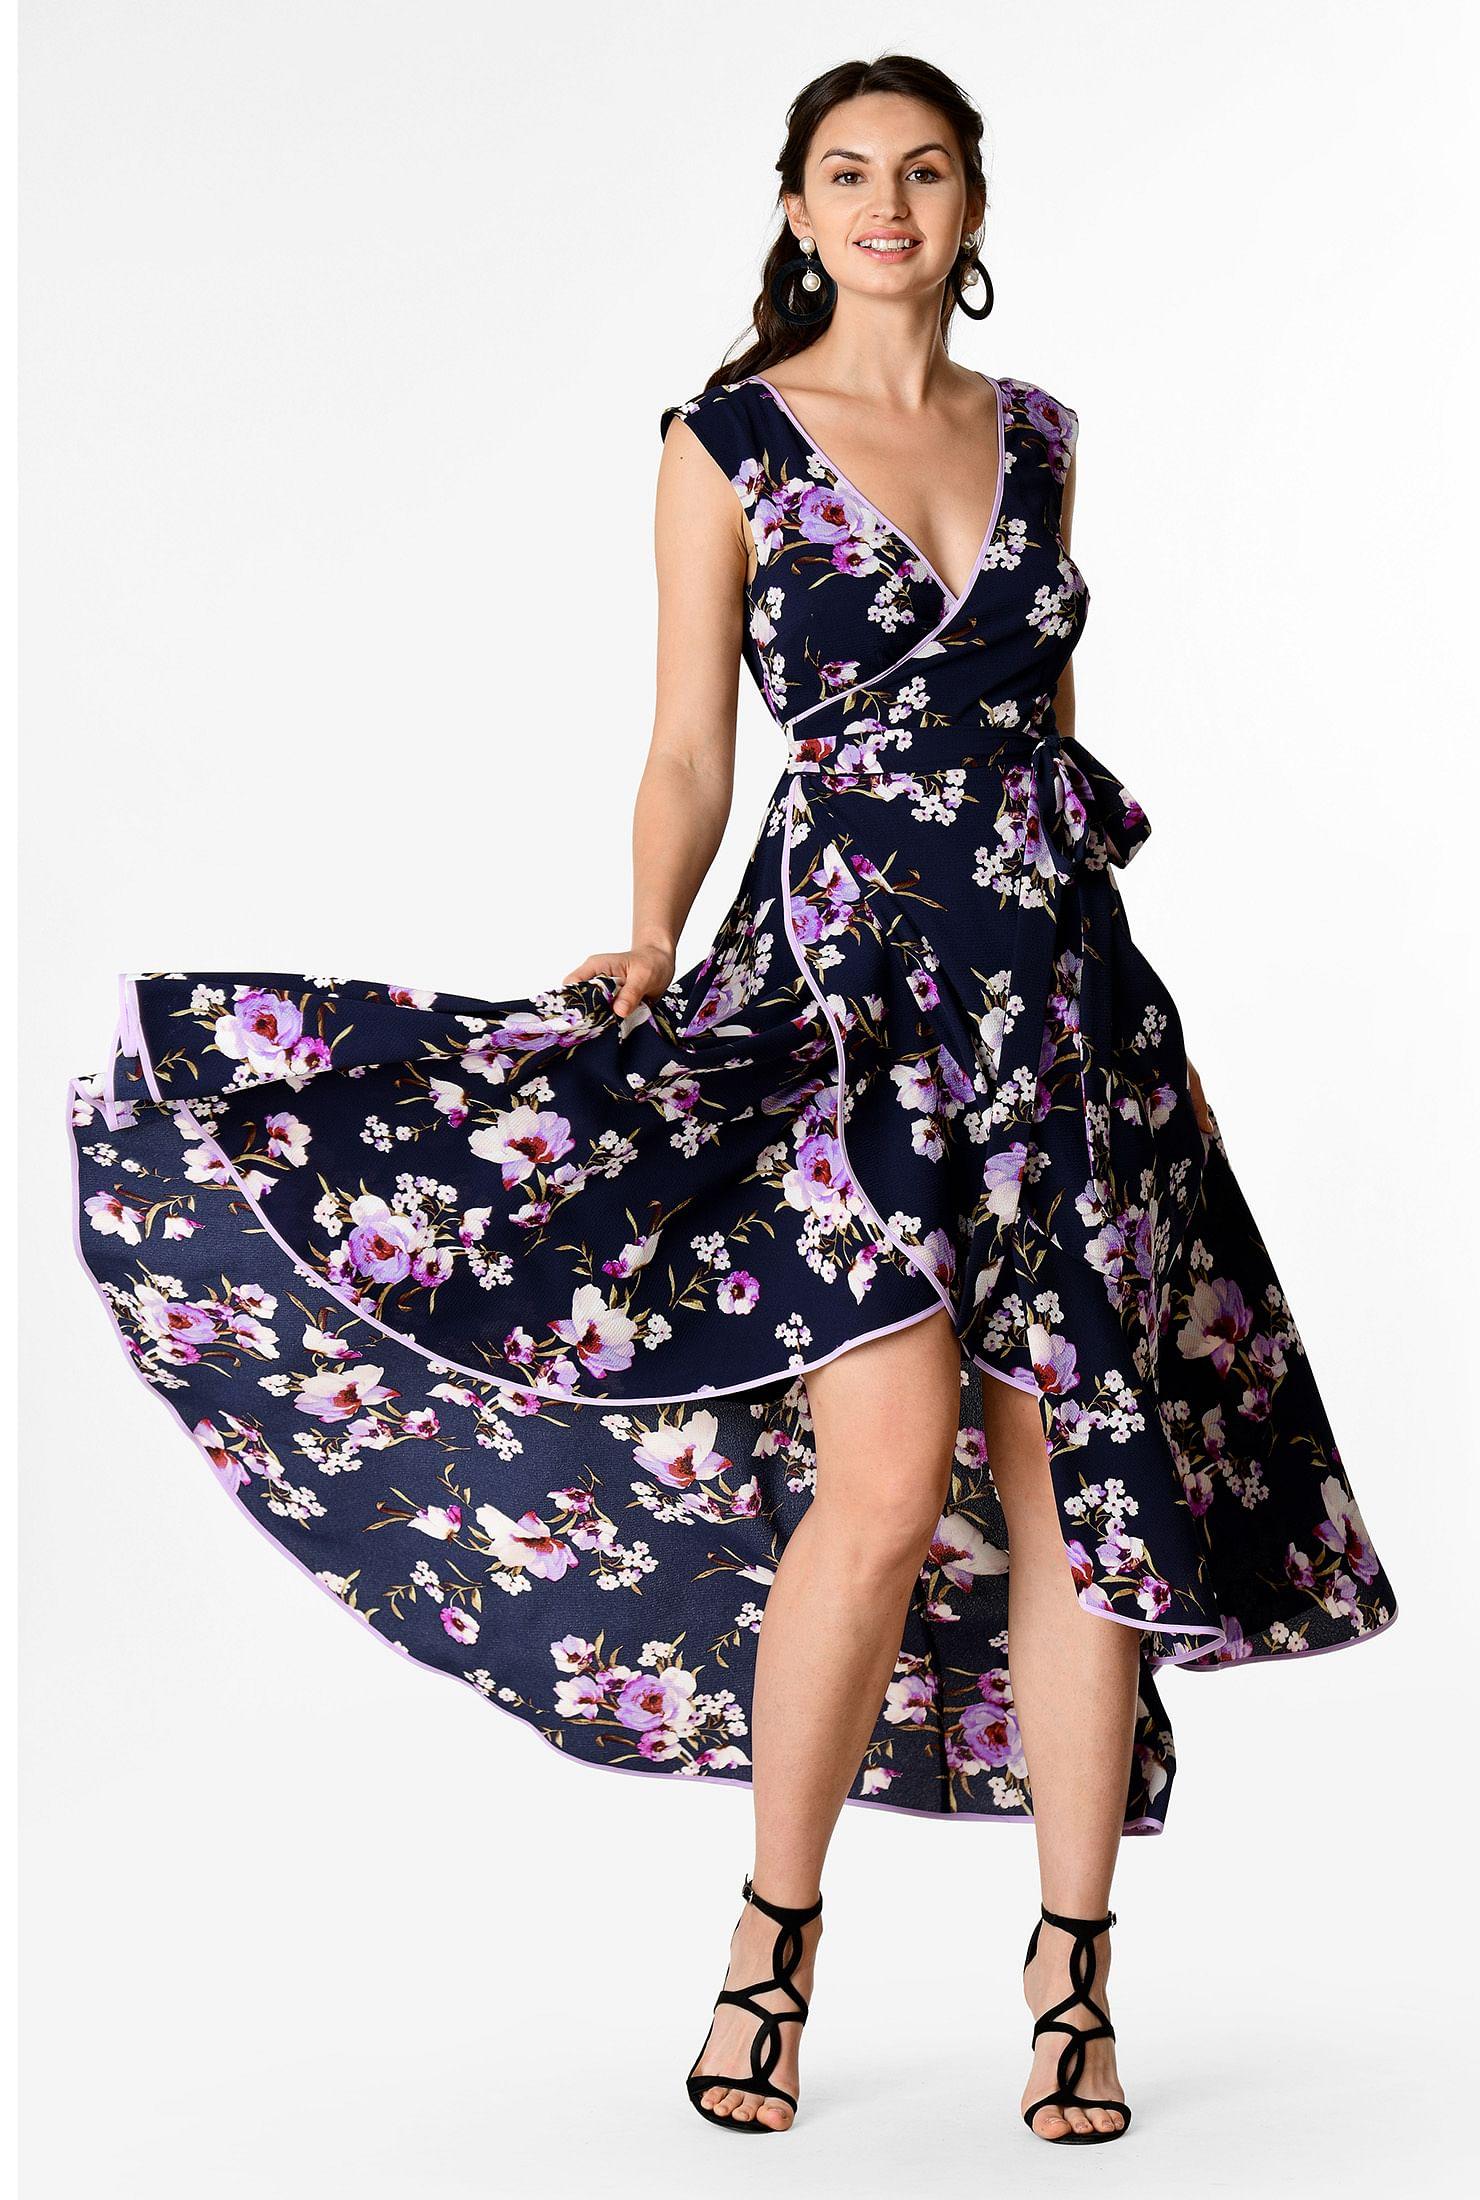 9973eb299 Women s Fashion Clothing 0-36W and Custom